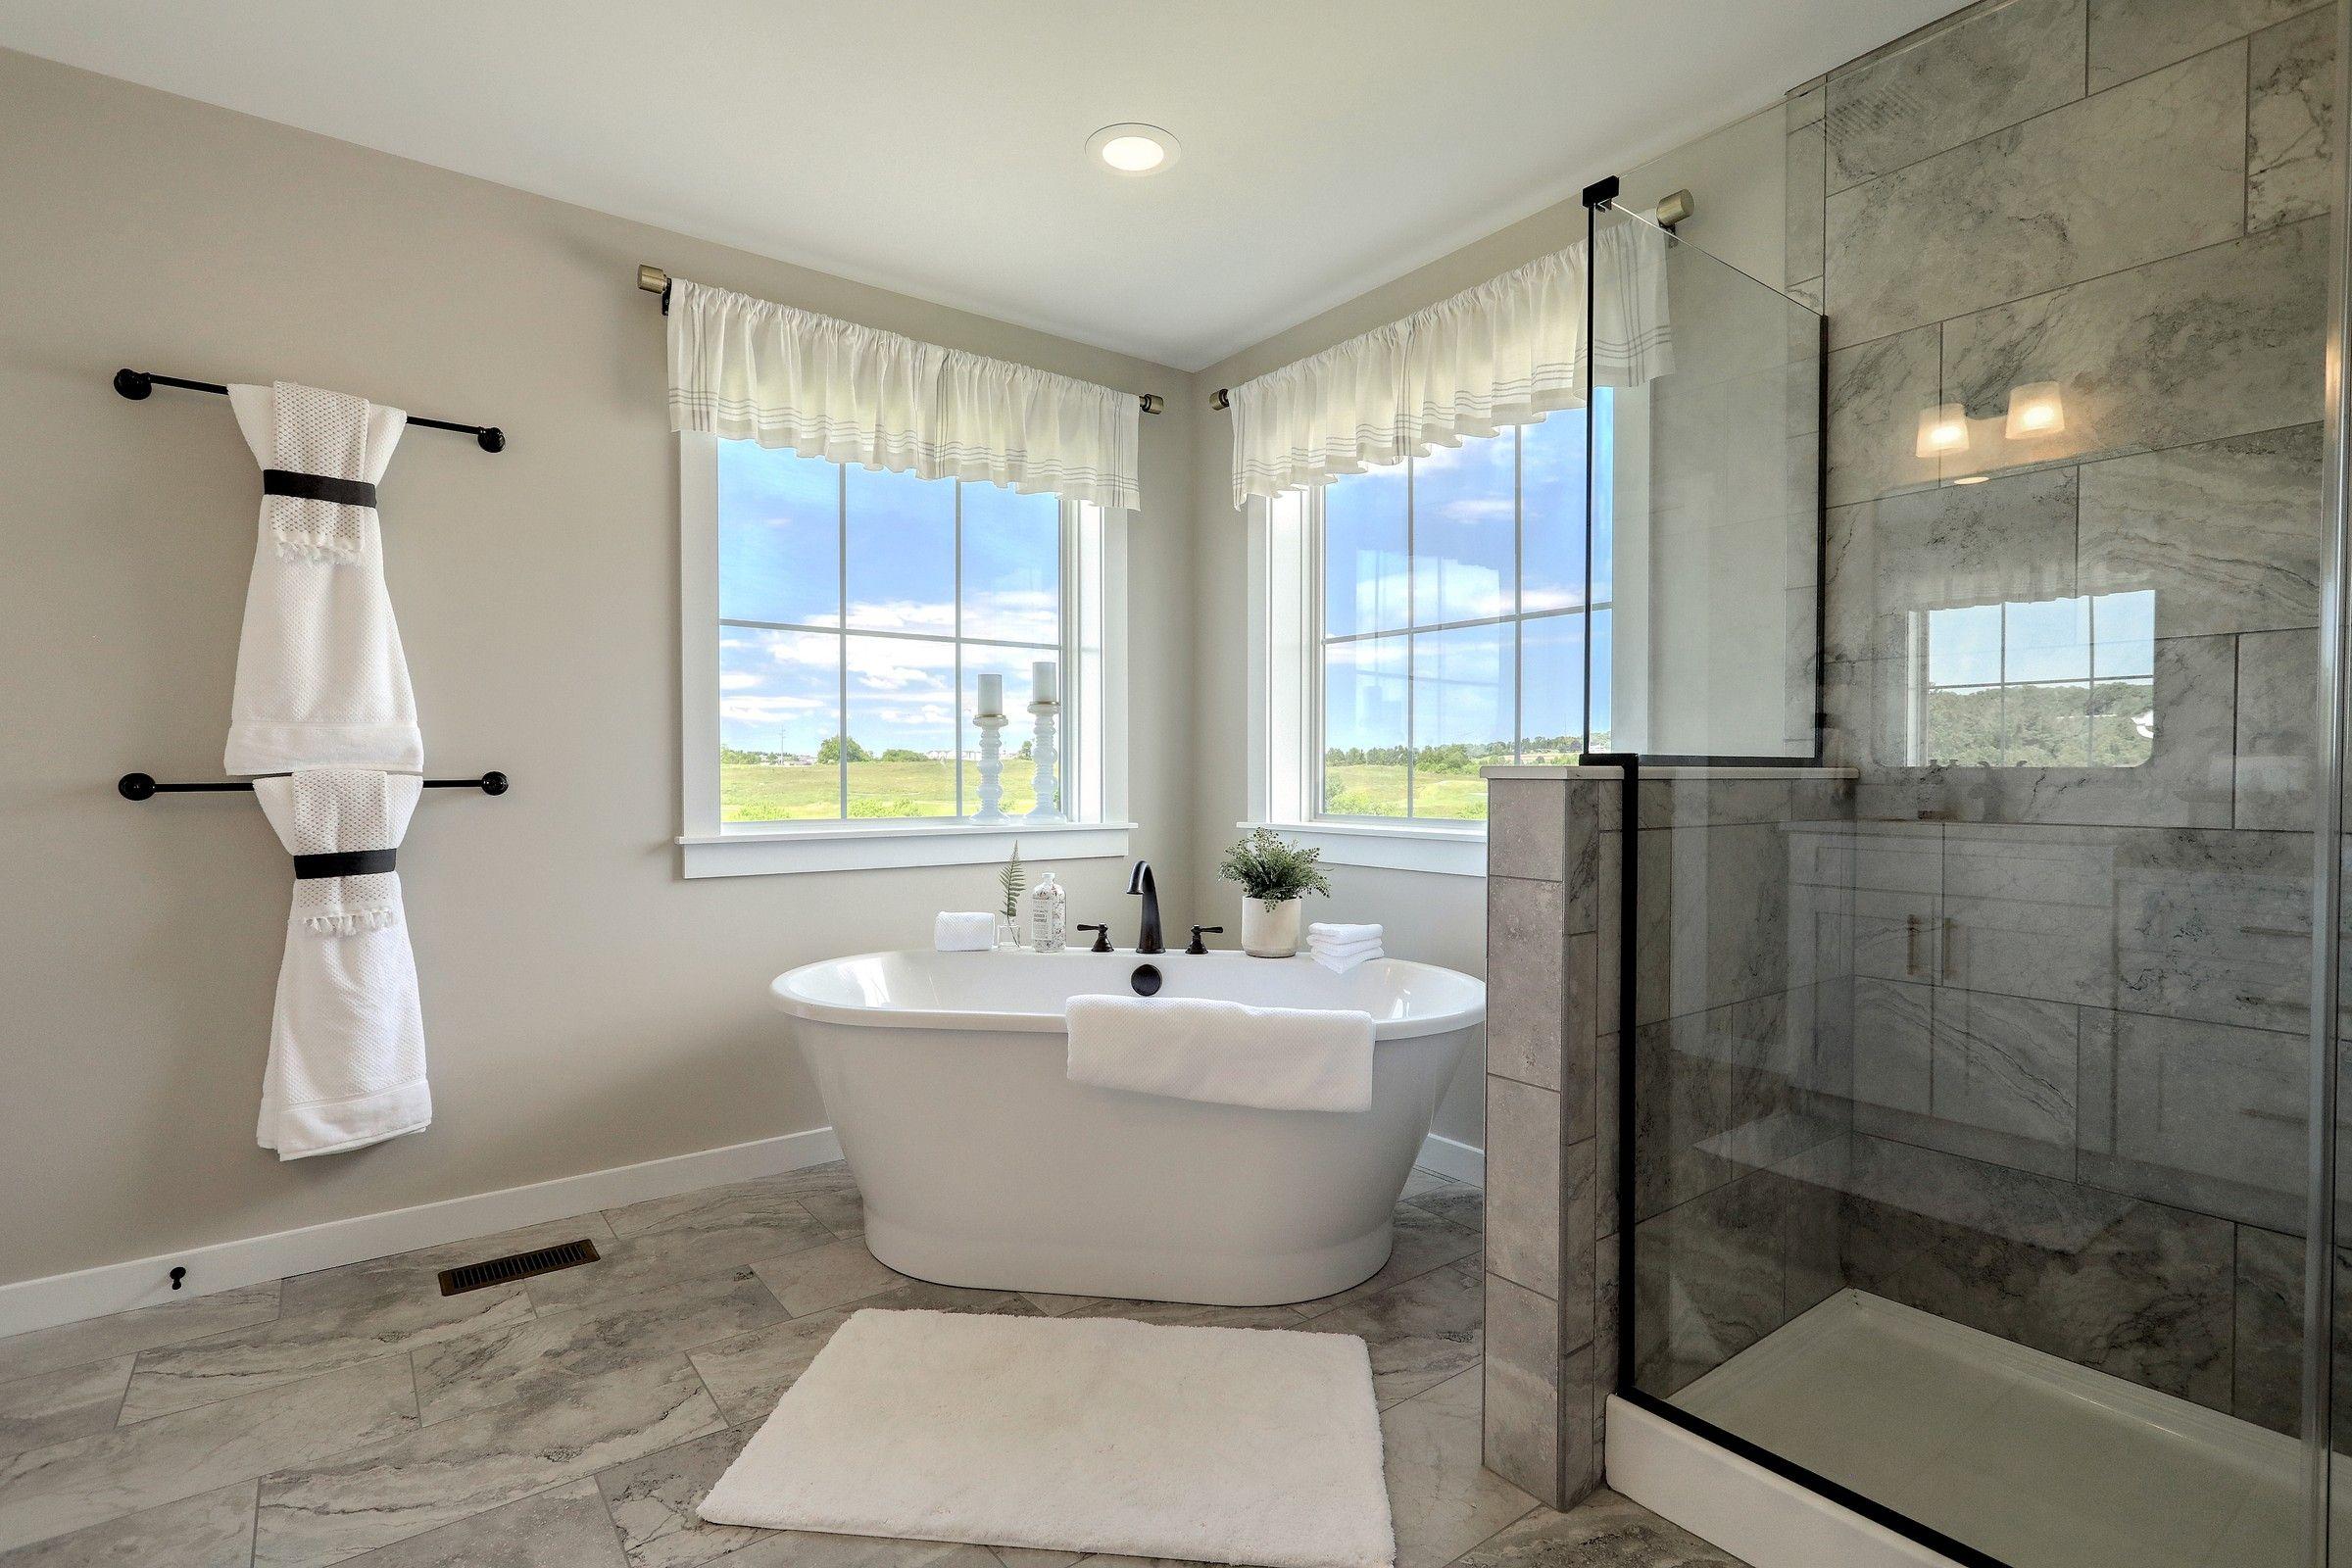 Bathroom featured in the Parker Bordeaux By Keystone Custom Homes in Philadelphia, PA